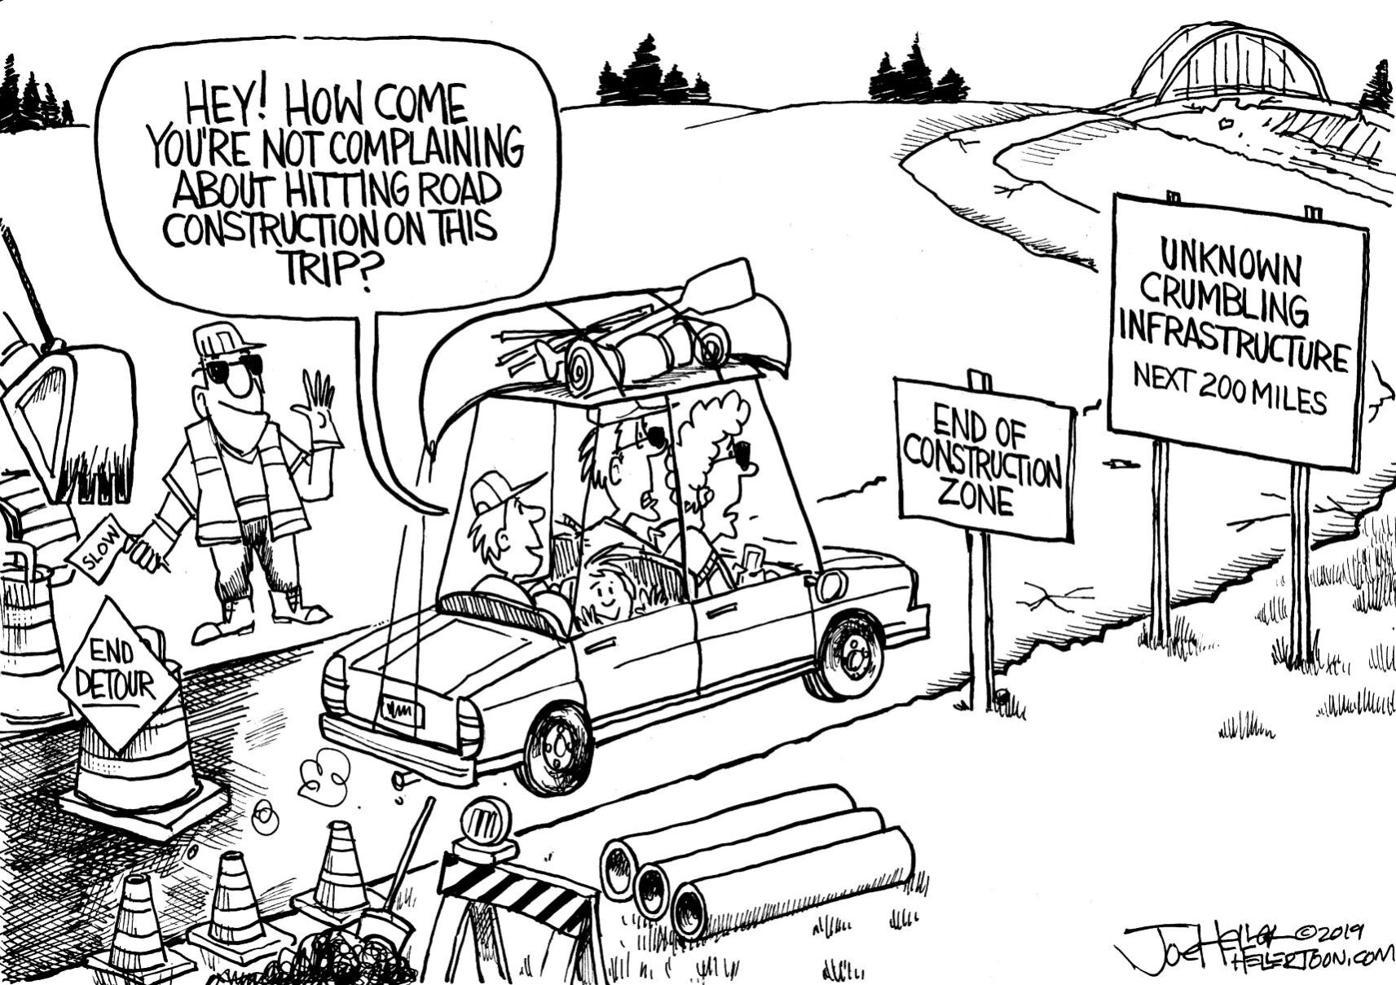 No complaints about road work?